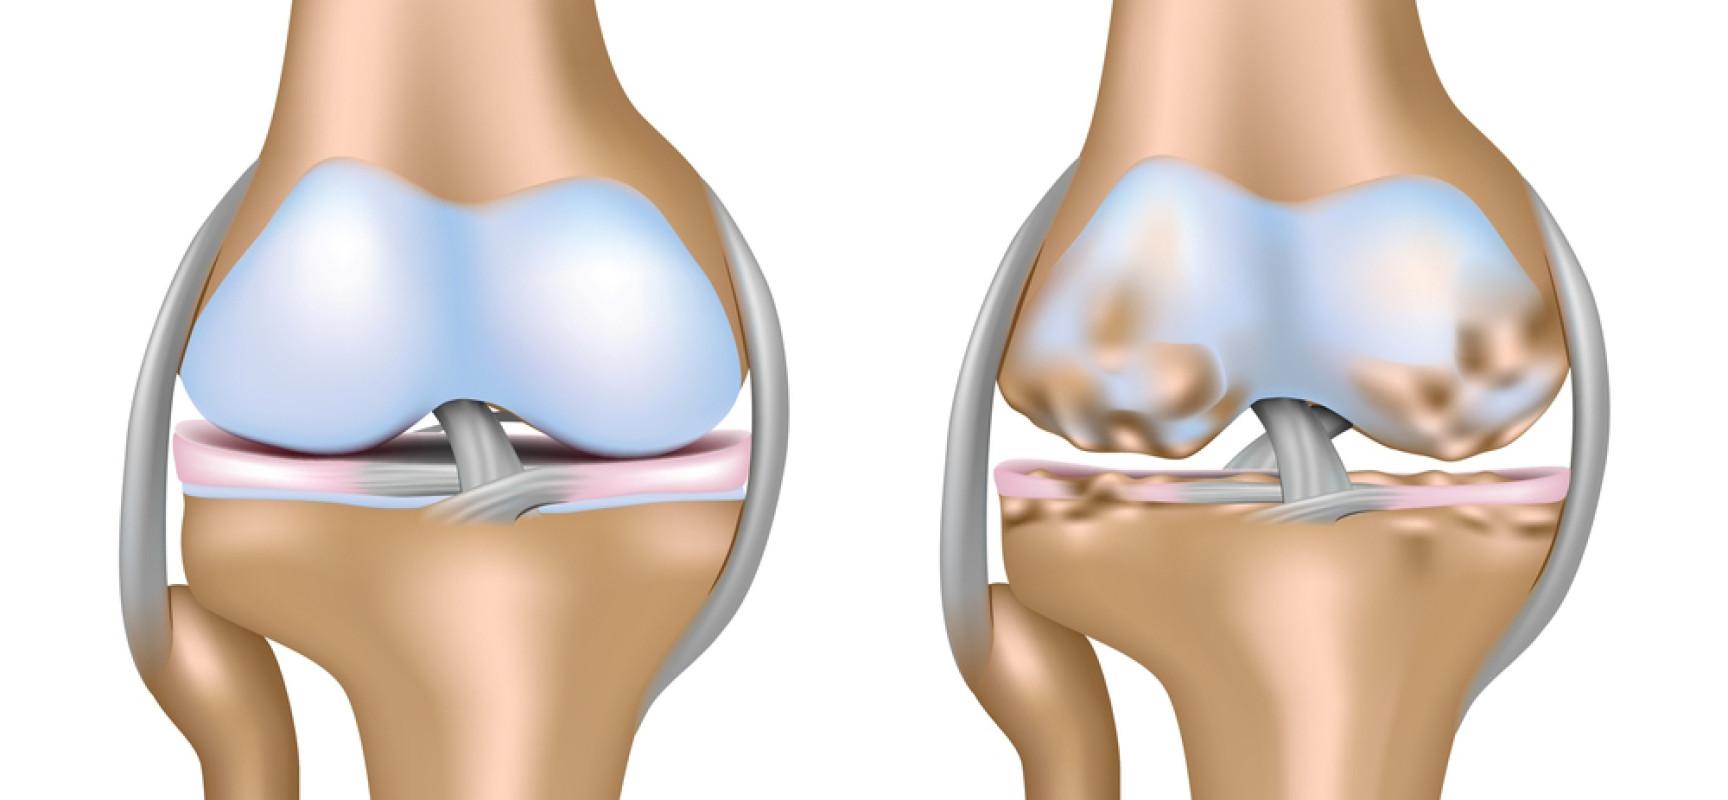 Физическая реабилитация при артритах суставов гирудотерапия при артрозе коленного сустава